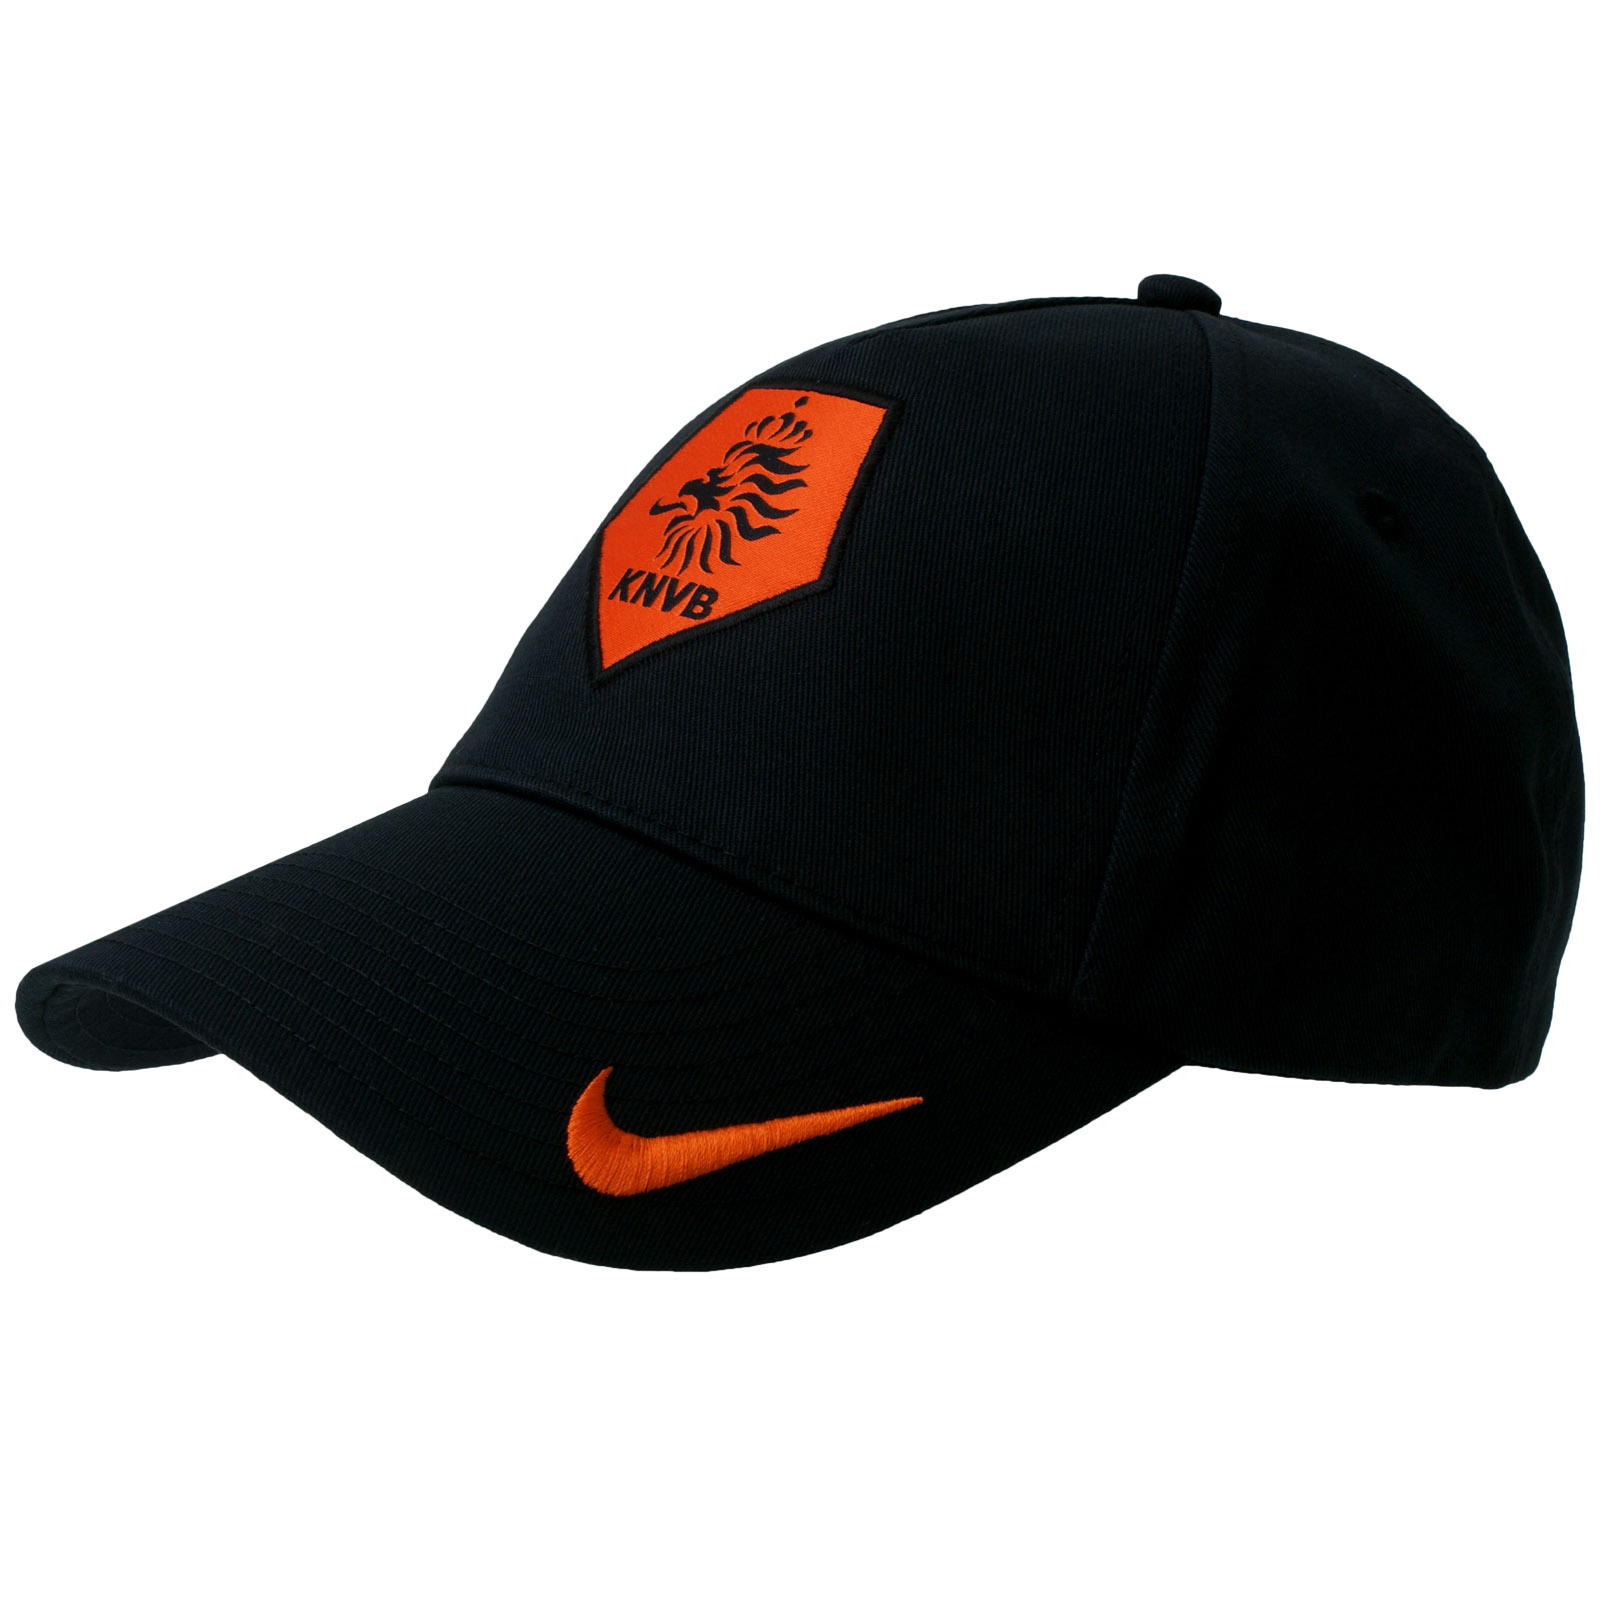 26368bcfa3ef8 Boné Nike Holanda   Preto Ref. 368942-010